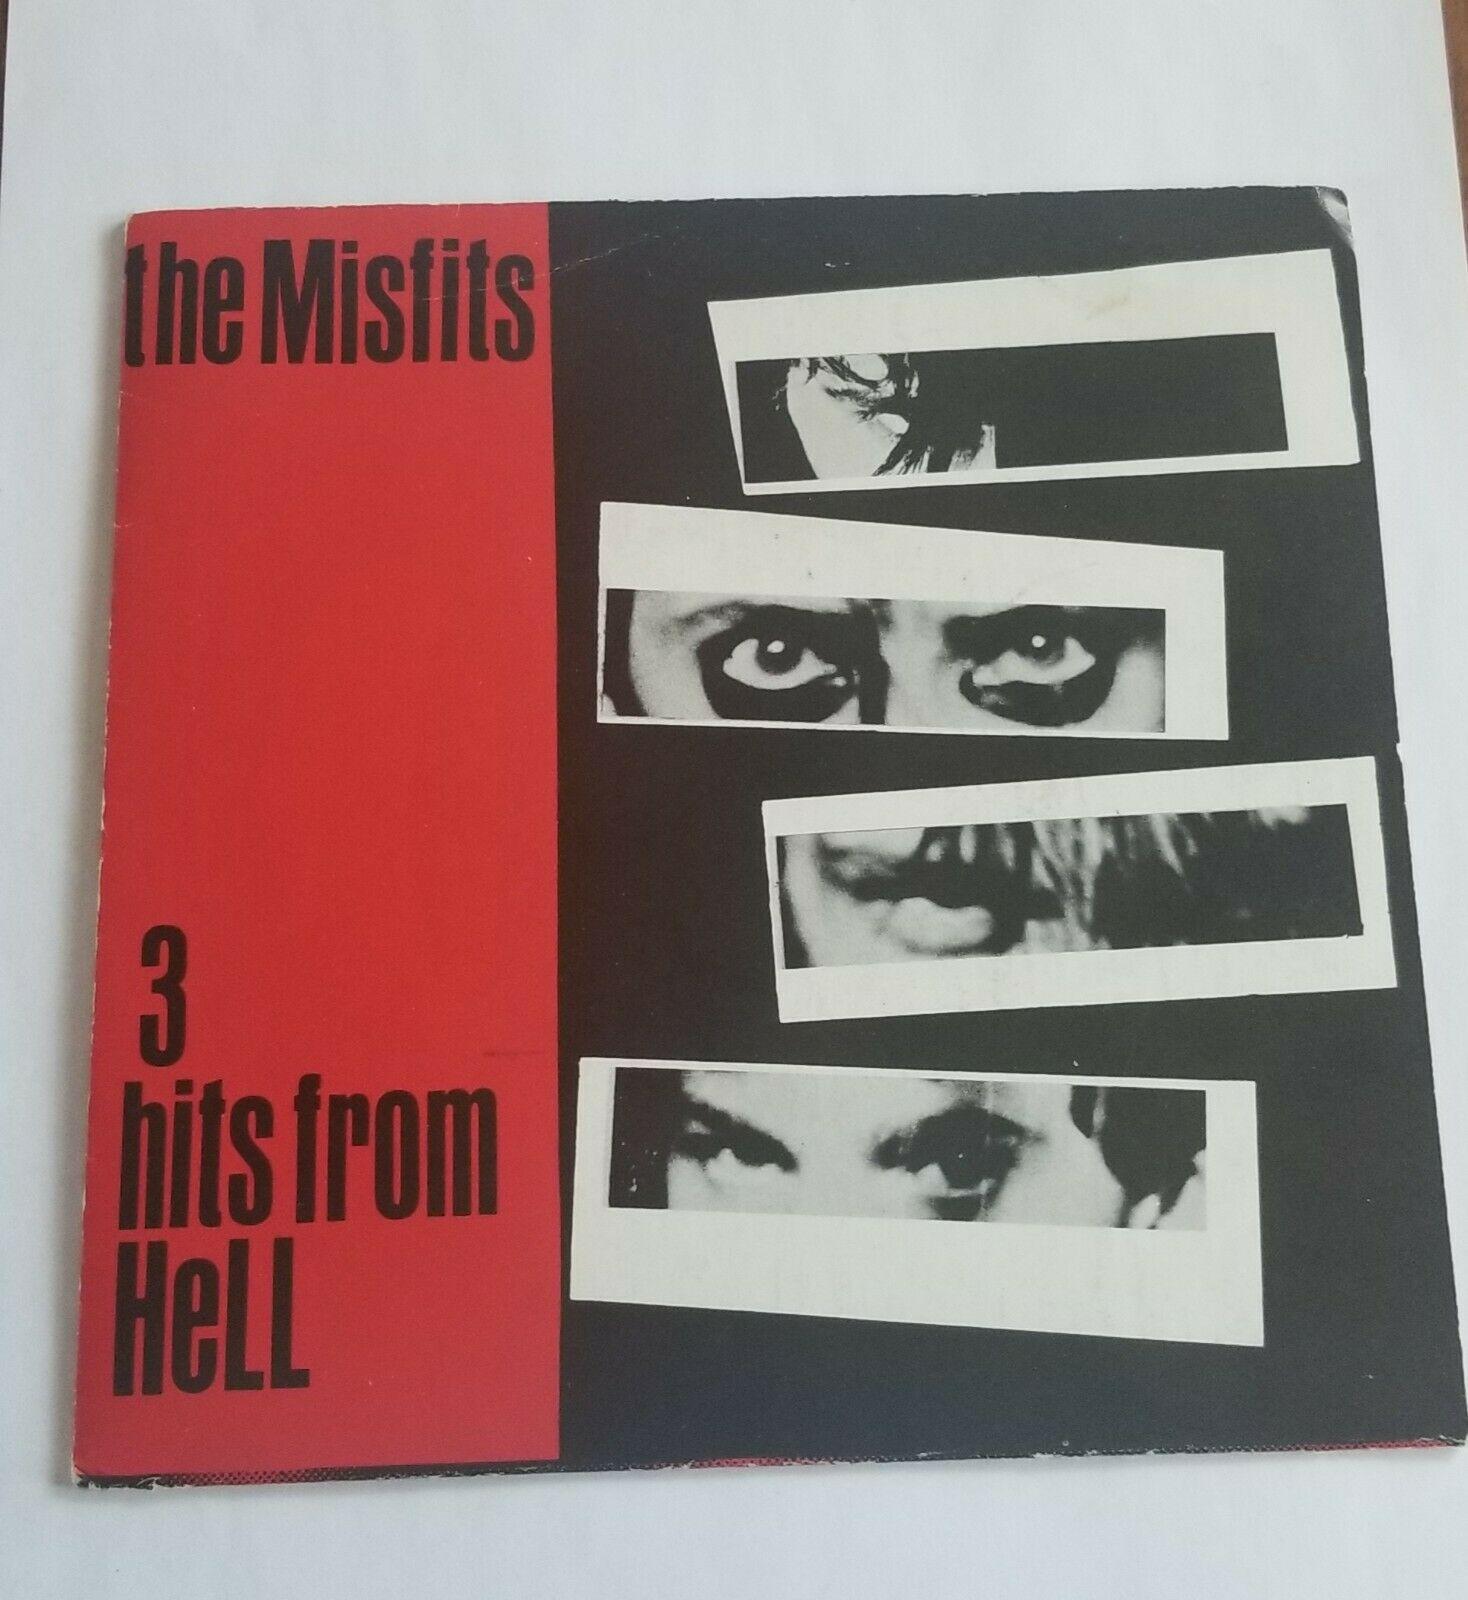 Misfits 3 hits from hell 7  vinyl  RARE